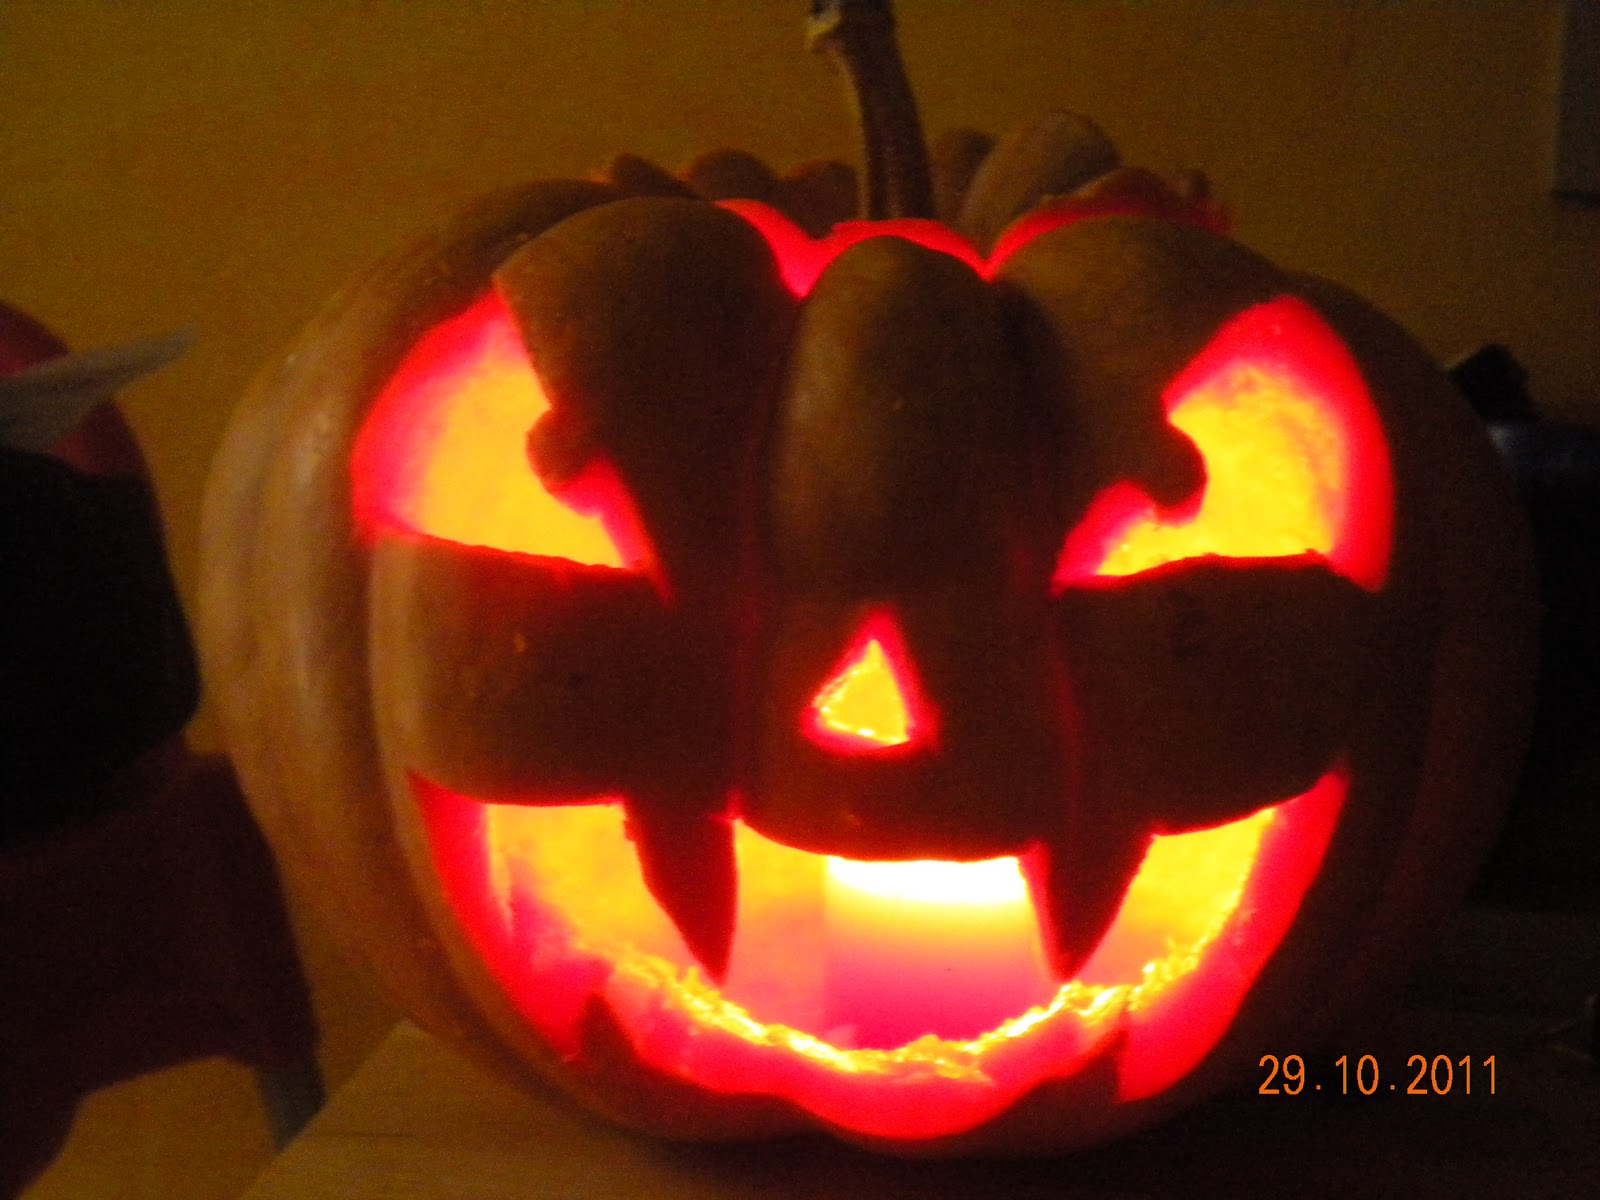 Barabao la zucca di halloween for Immagini zucca di halloween